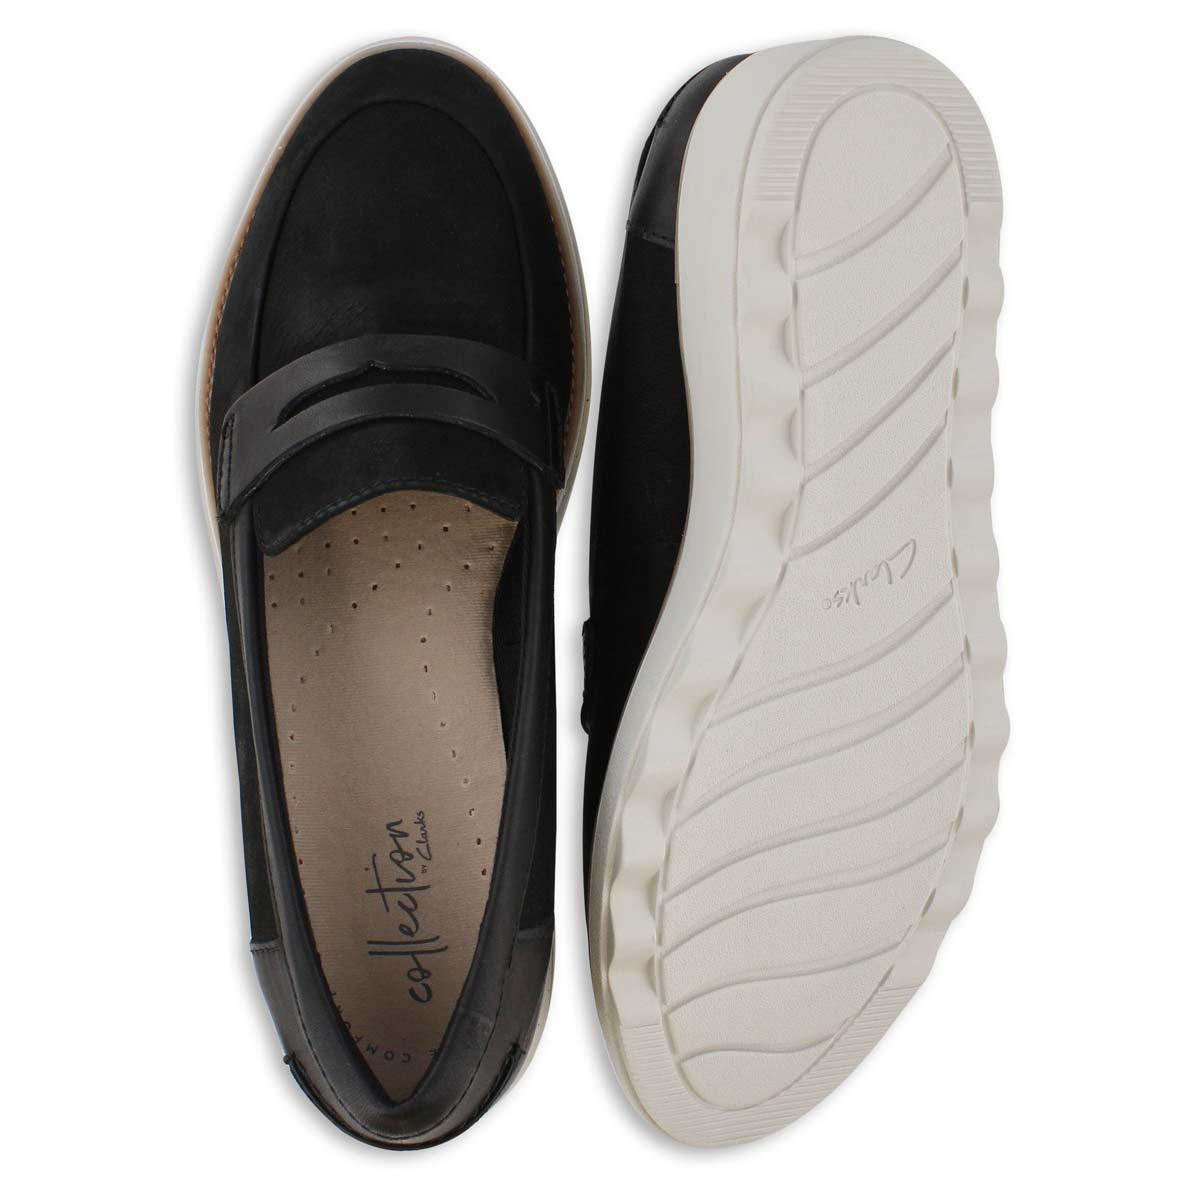 Lds Sharon Ranch black wedge loafer